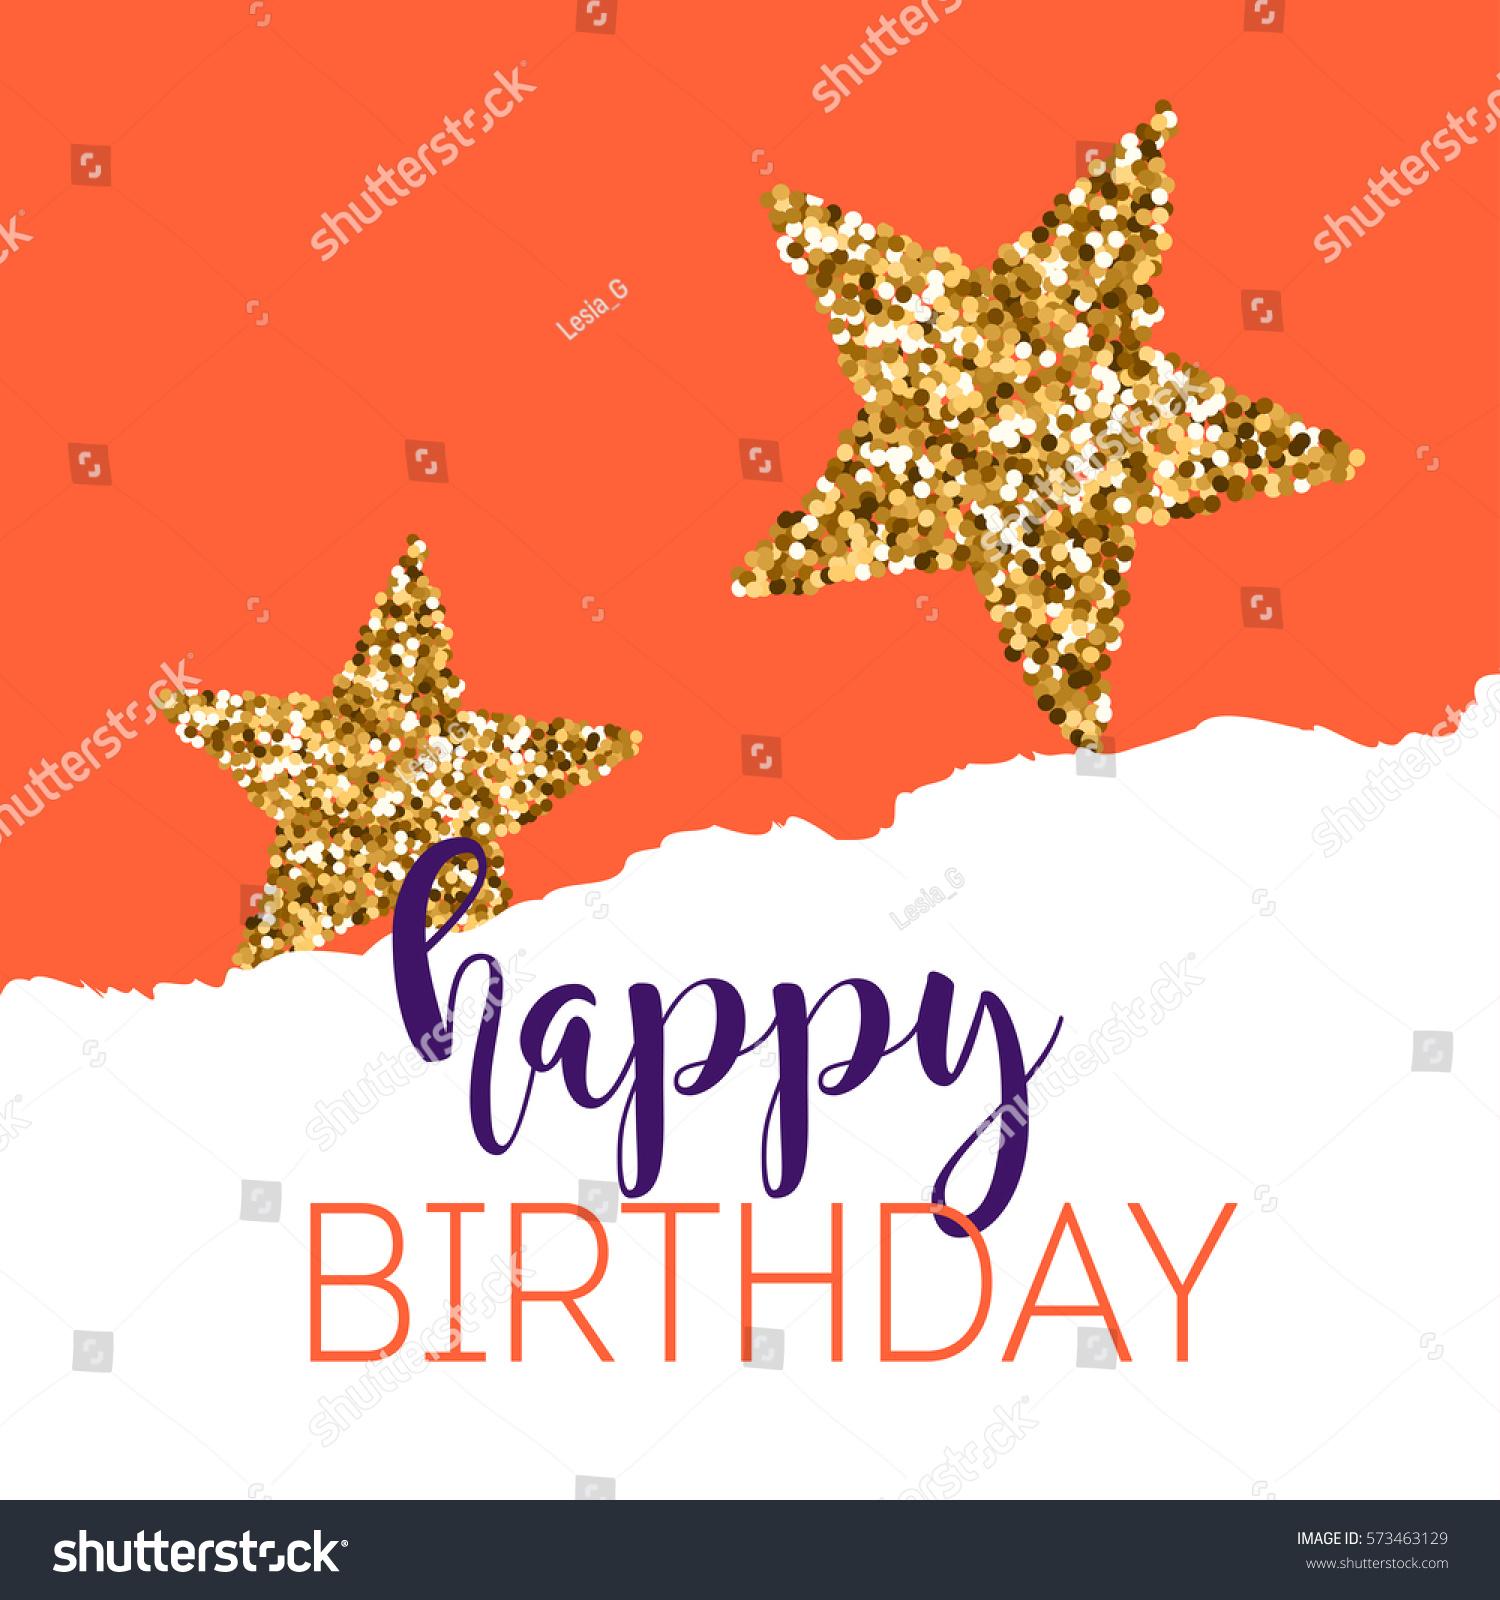 Birthday greeting cards gold glitter design stock vector 573463129 birthday greeting cards with gold glitter design vector illustration kristyandbryce Images